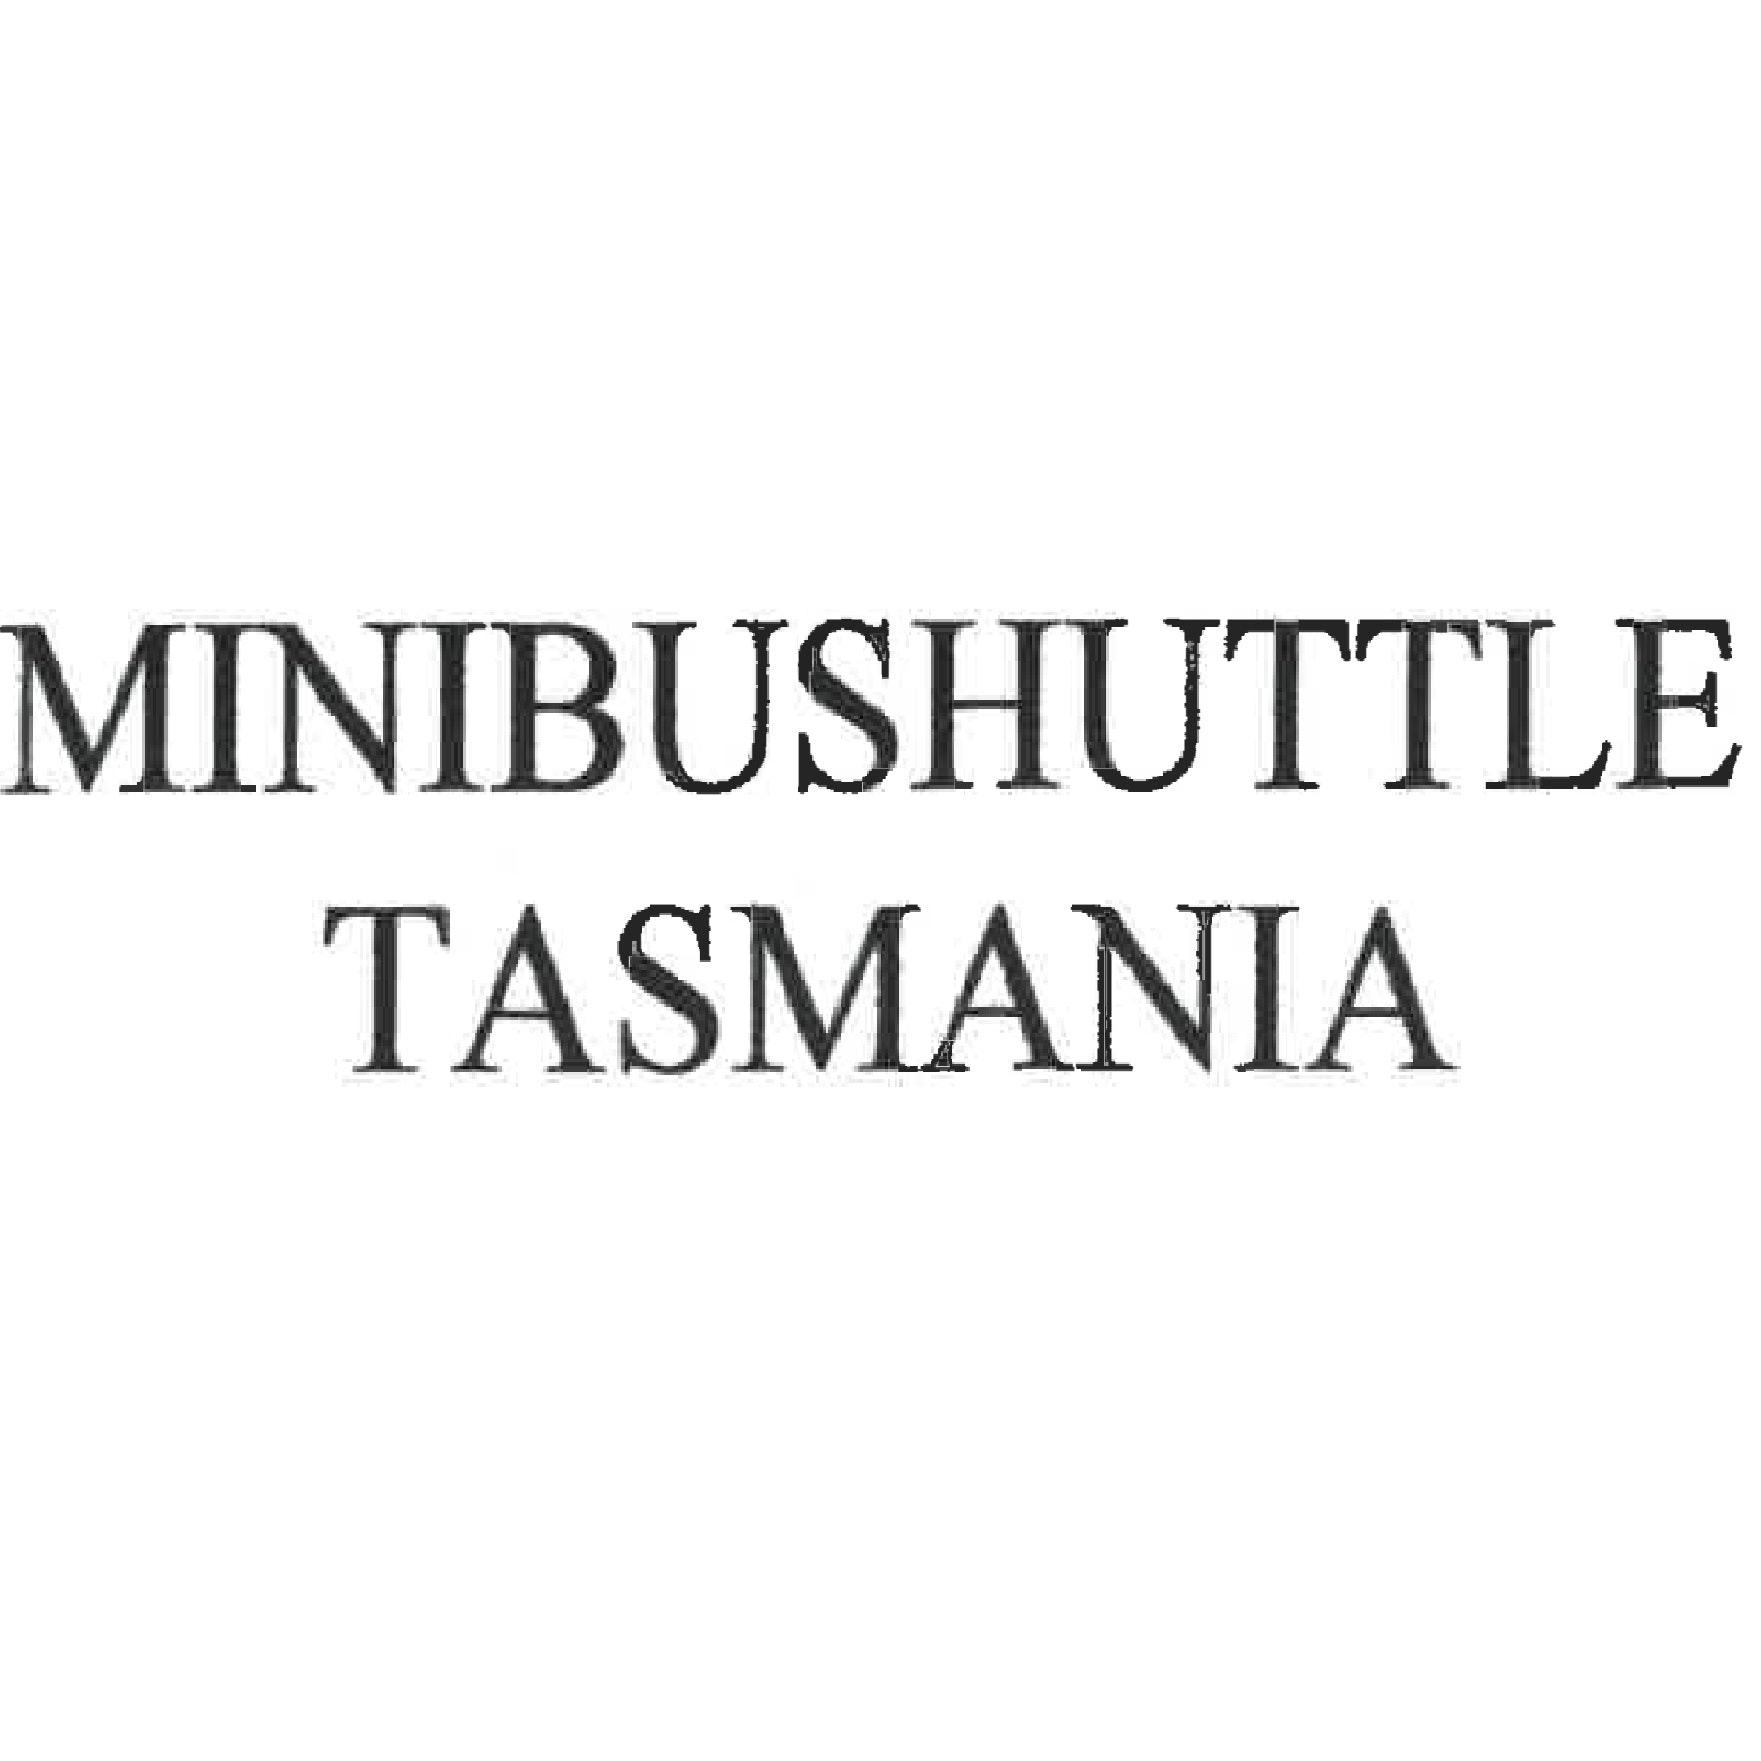 Mini Bus Shuttle Tasmania logo